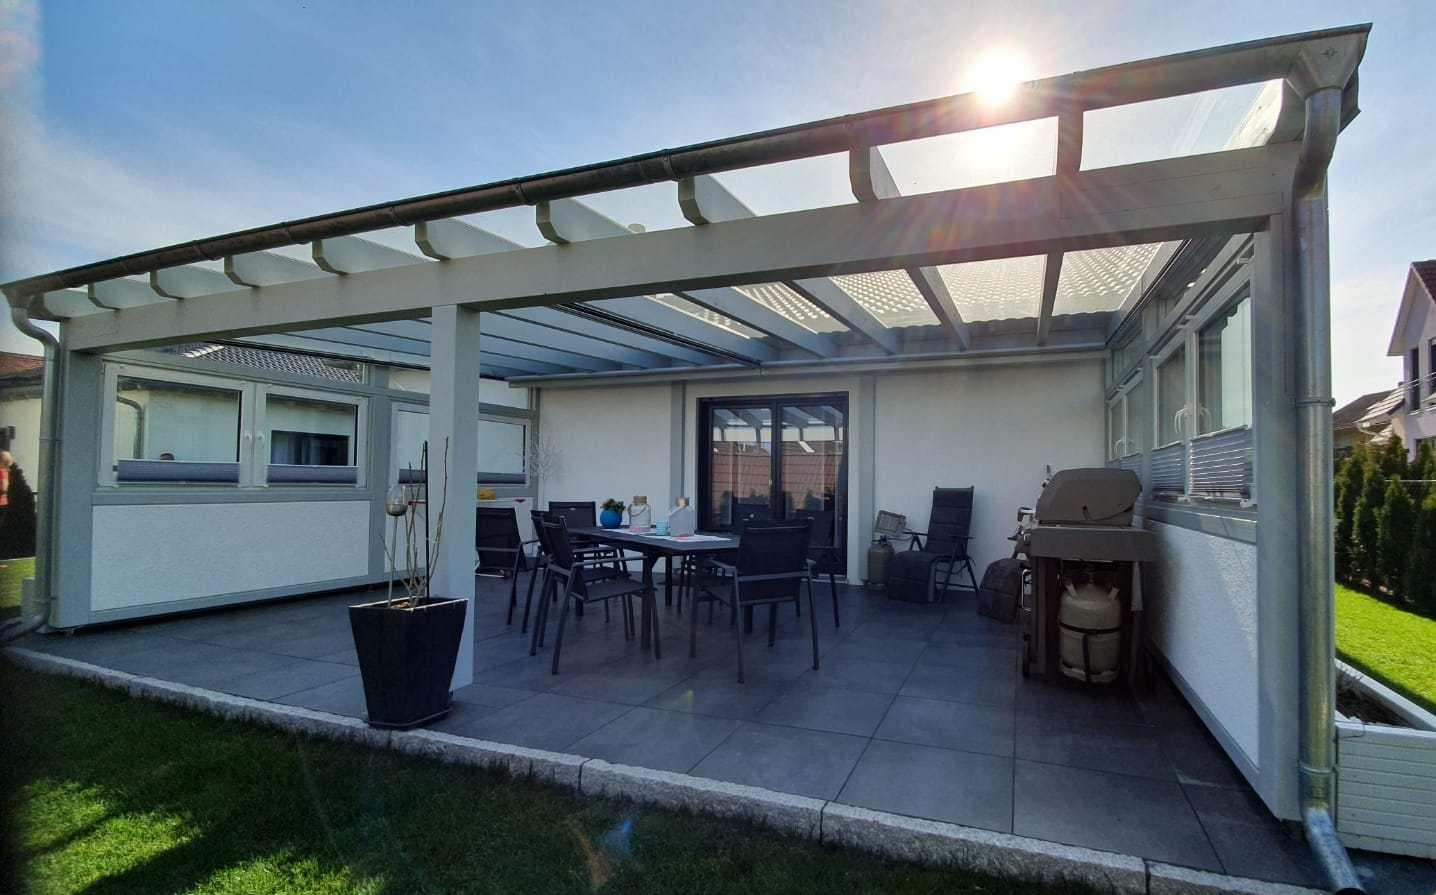 Projekt: Freiraumgestaltung Terrassenüberdachung Aurach